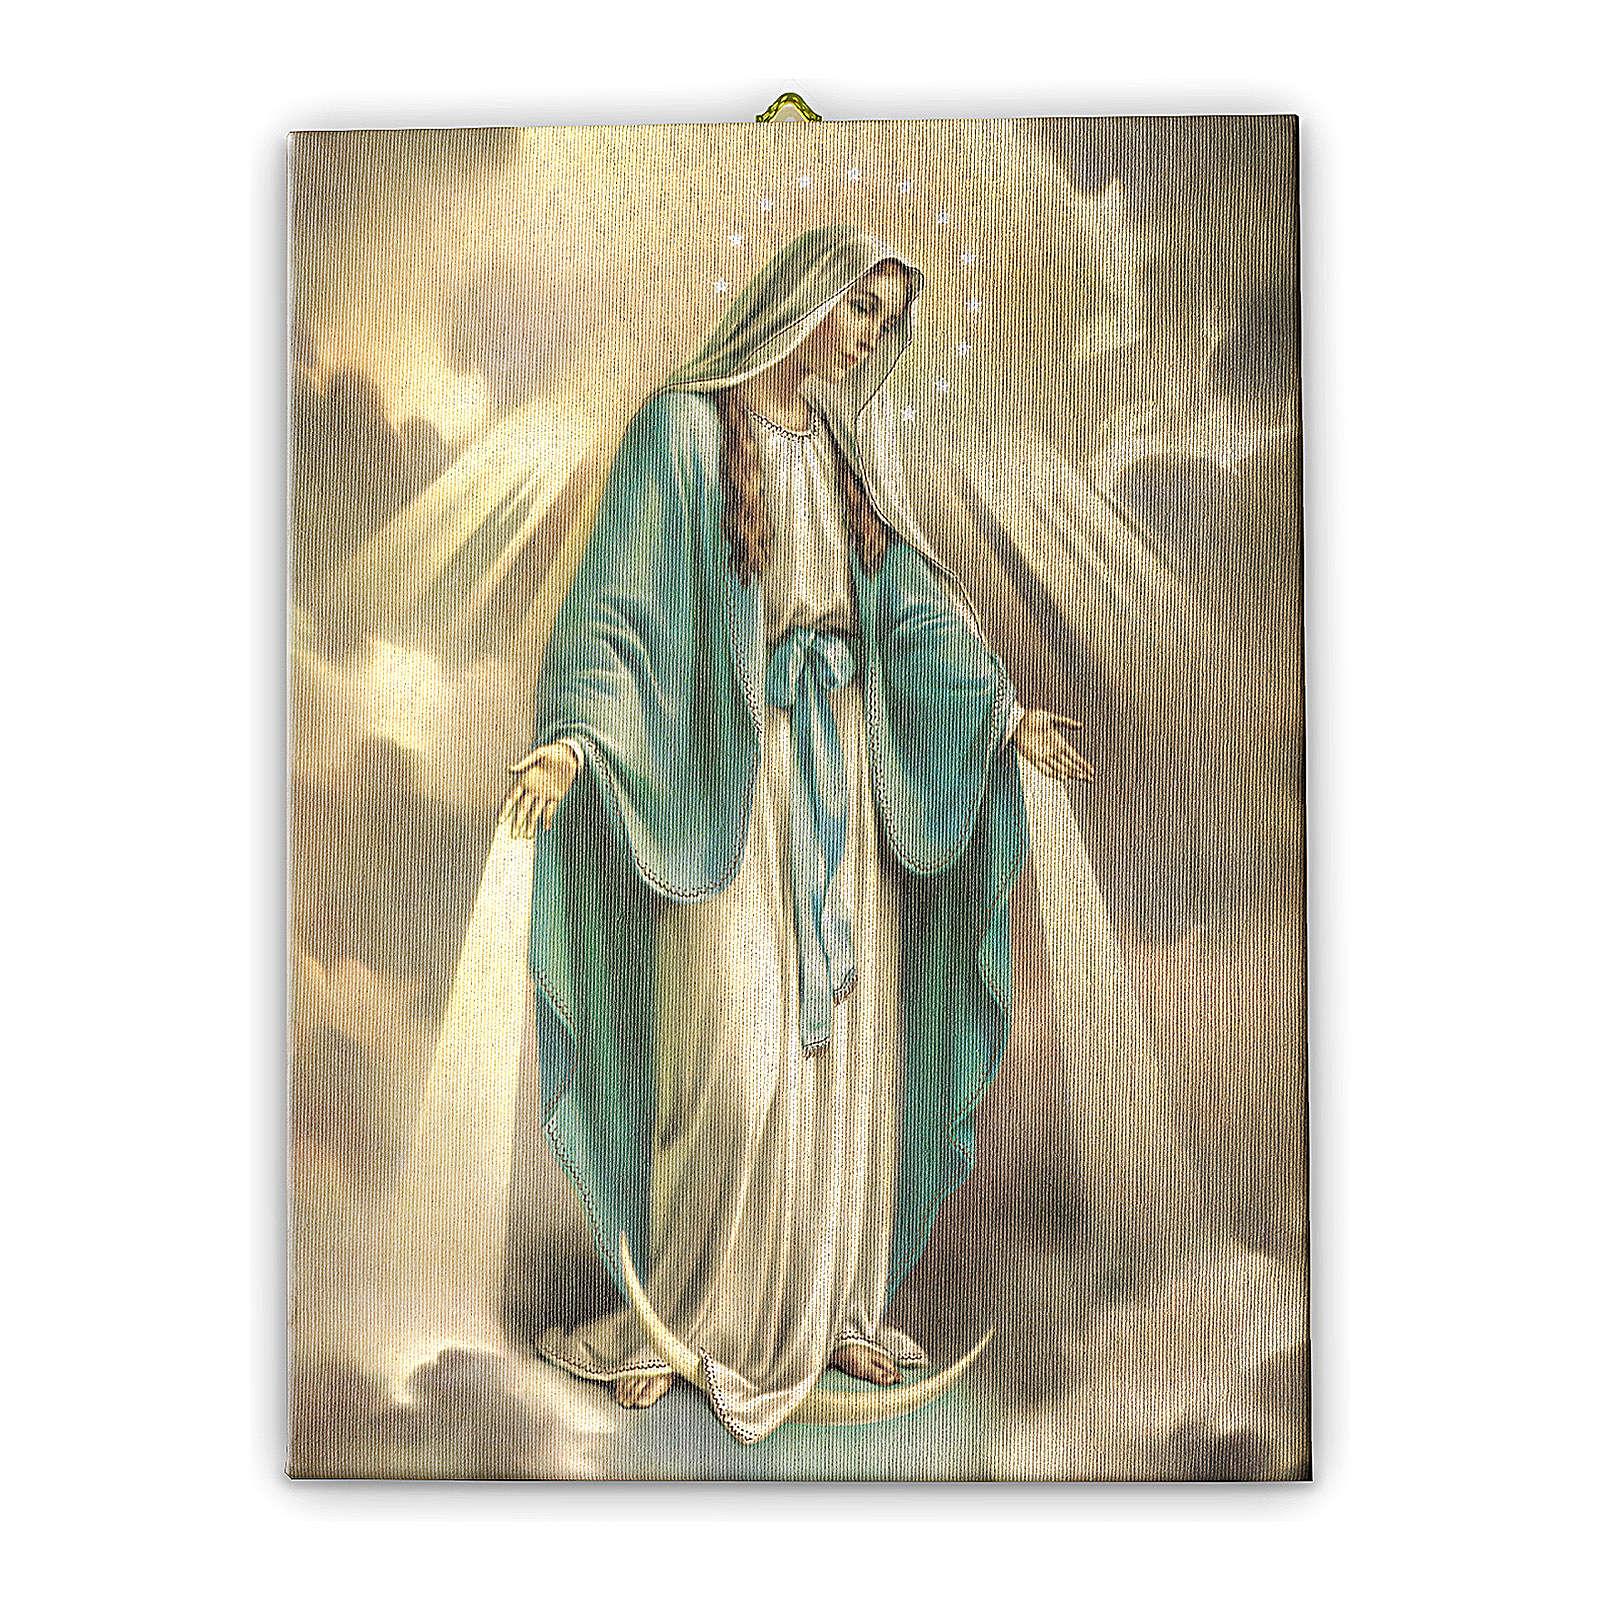 Cuadro sobre tela pictórica Virgen Milagrosa 40x30 cm 3